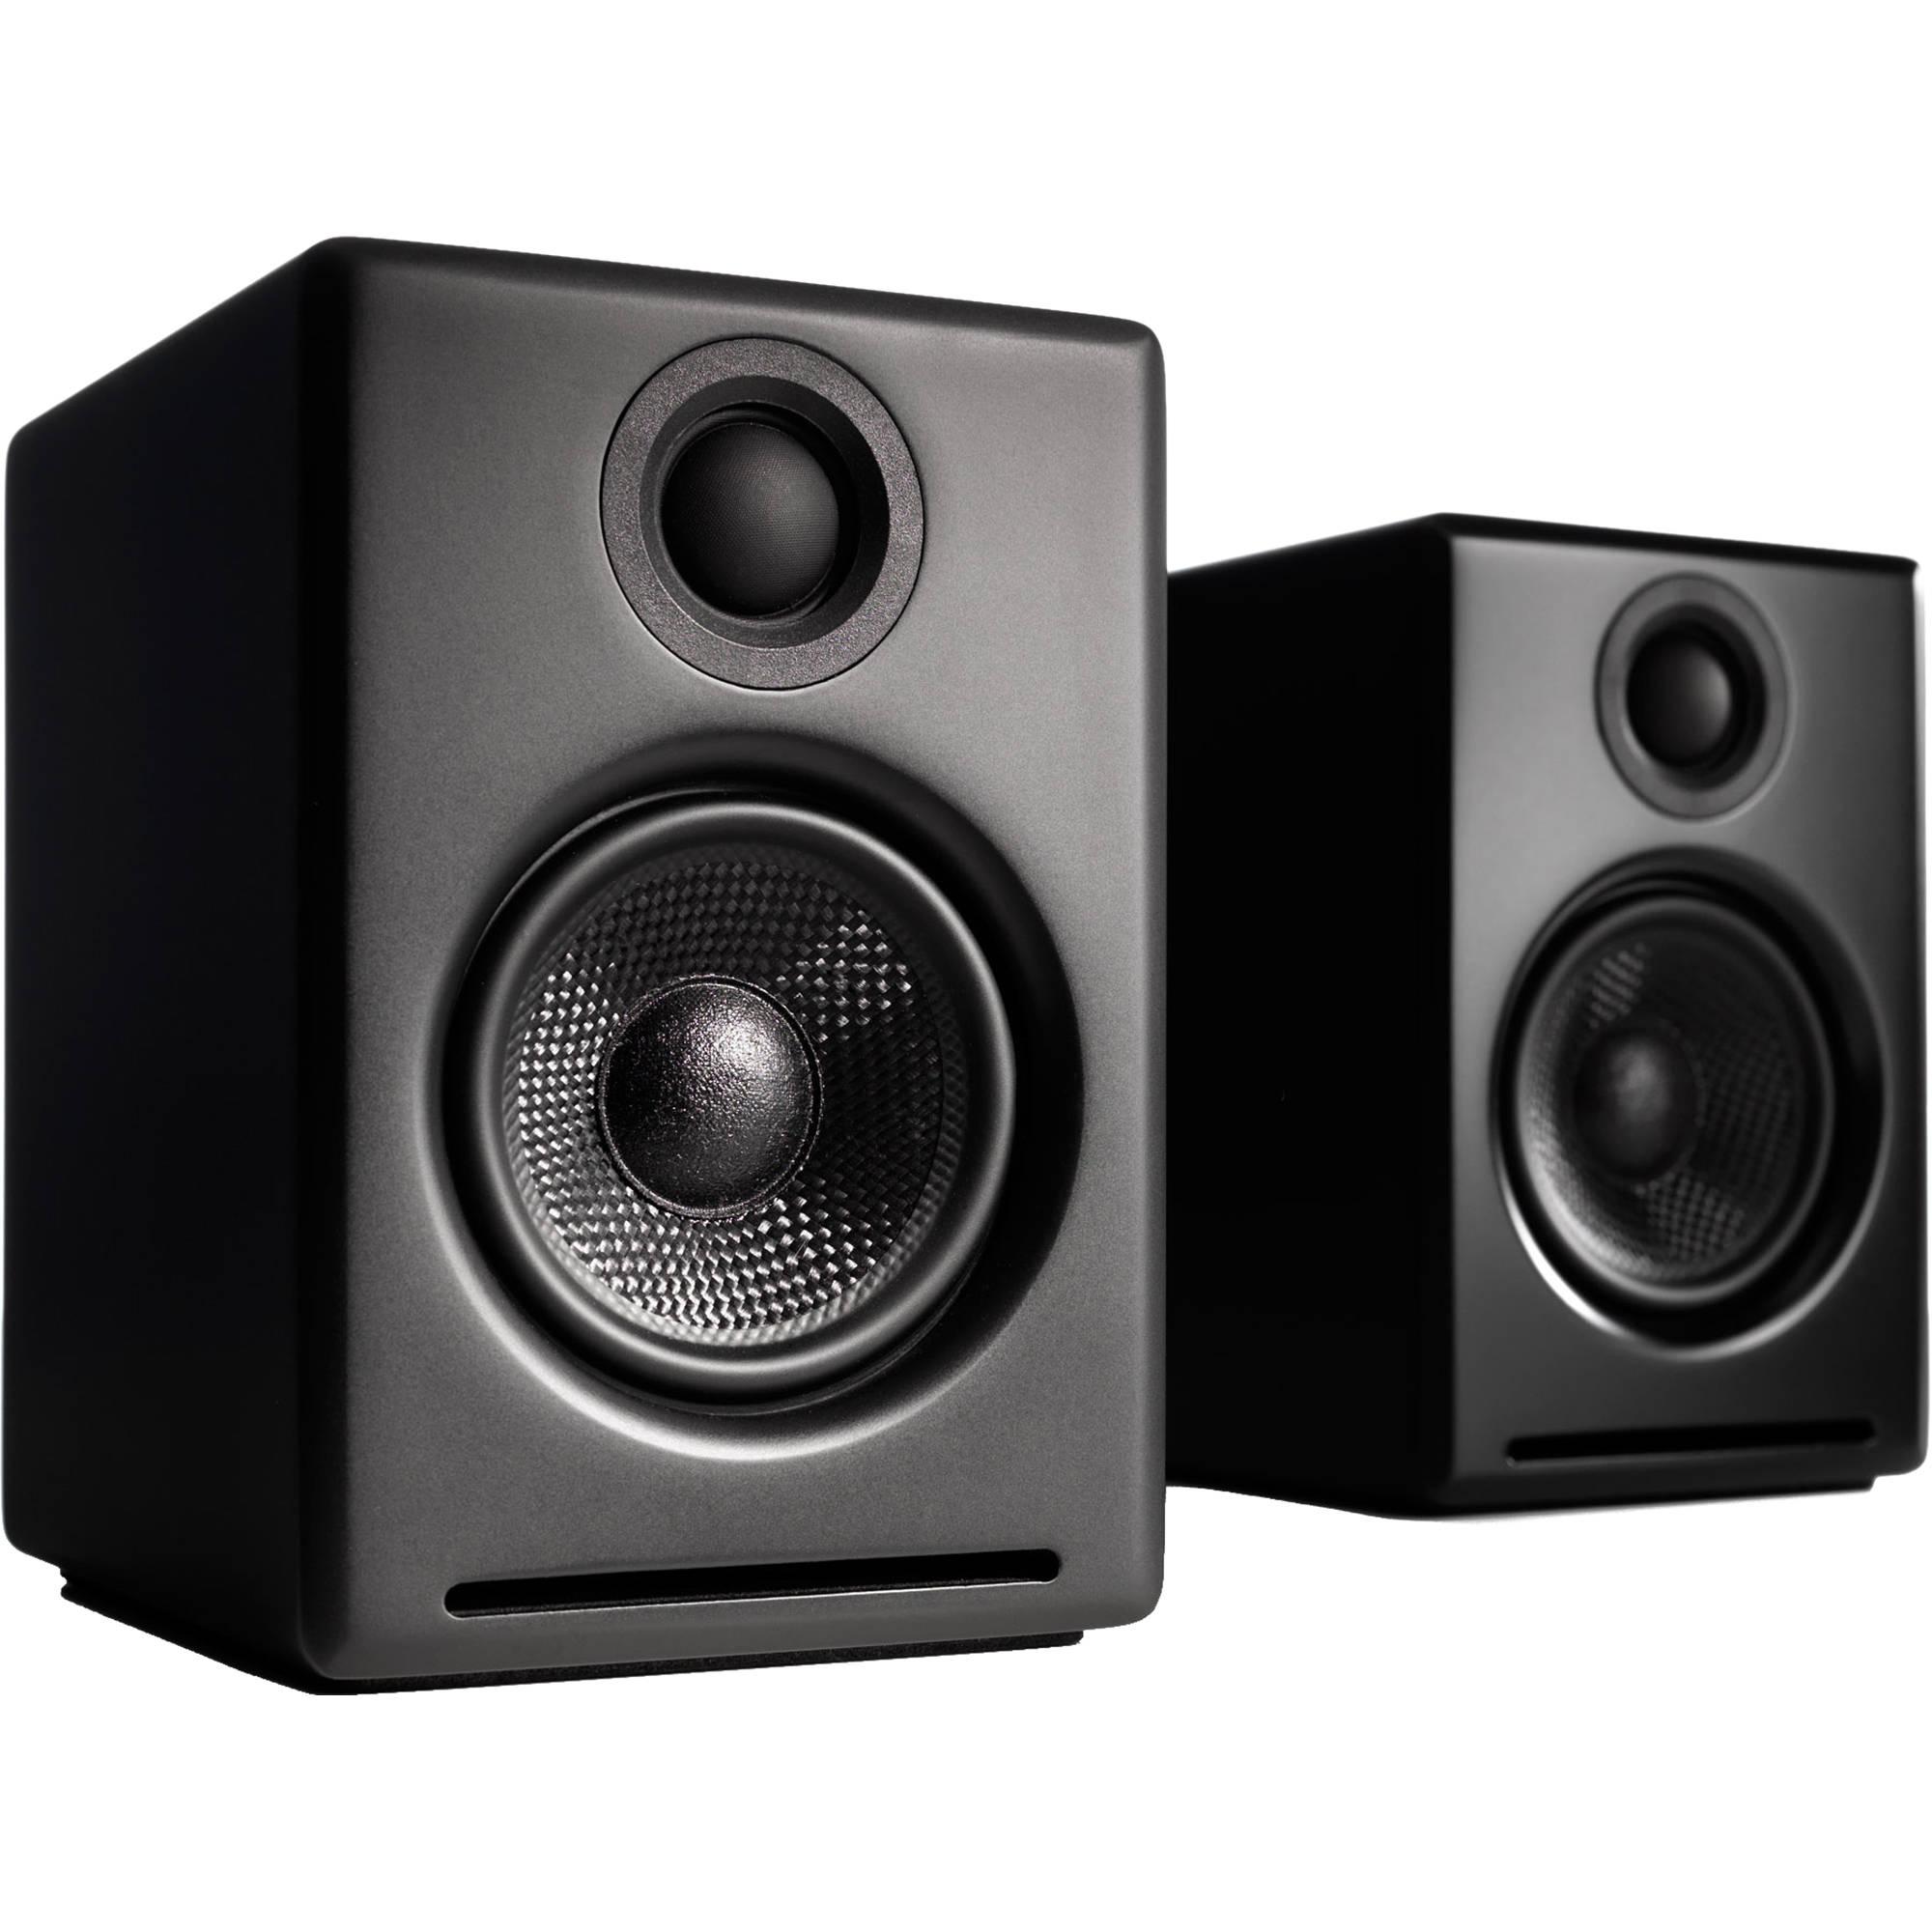 Built-in 16Bit DAC and Amplifier Audioengine A2+ Wireless 60W Powered Desktop Speakers Bluetooth aptX Codec Black